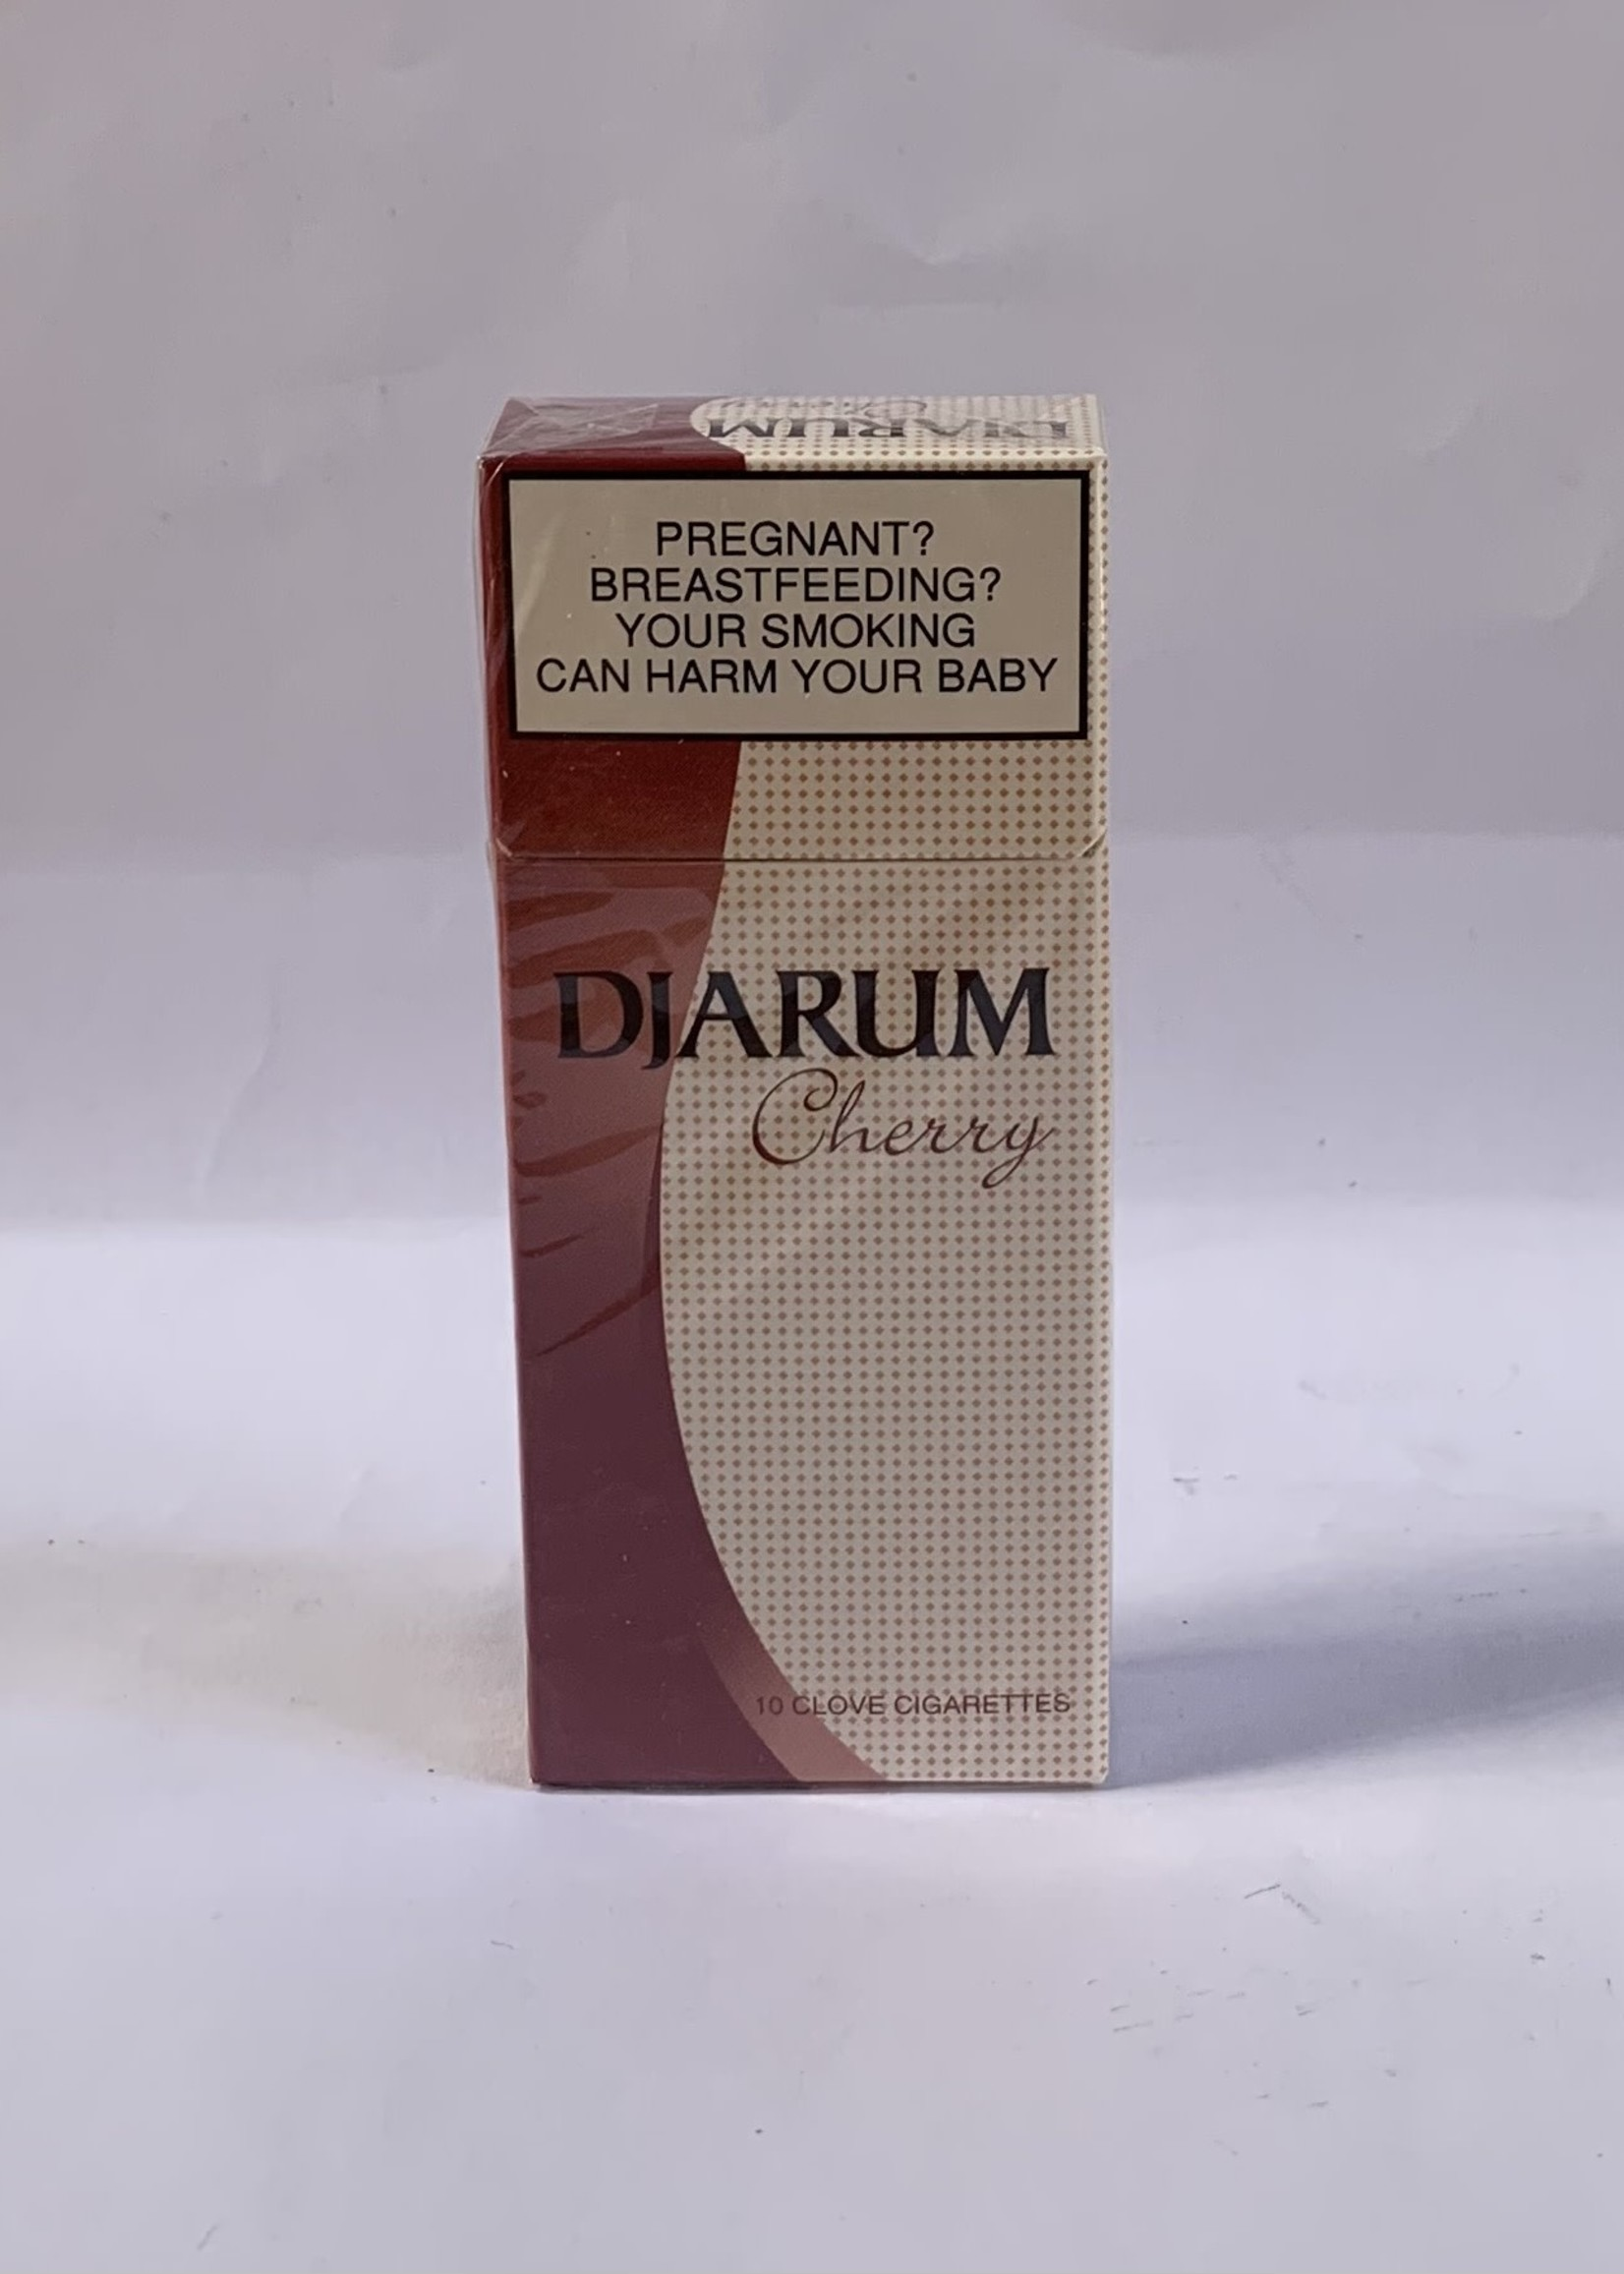 Djarum clove cigarettes - cherry